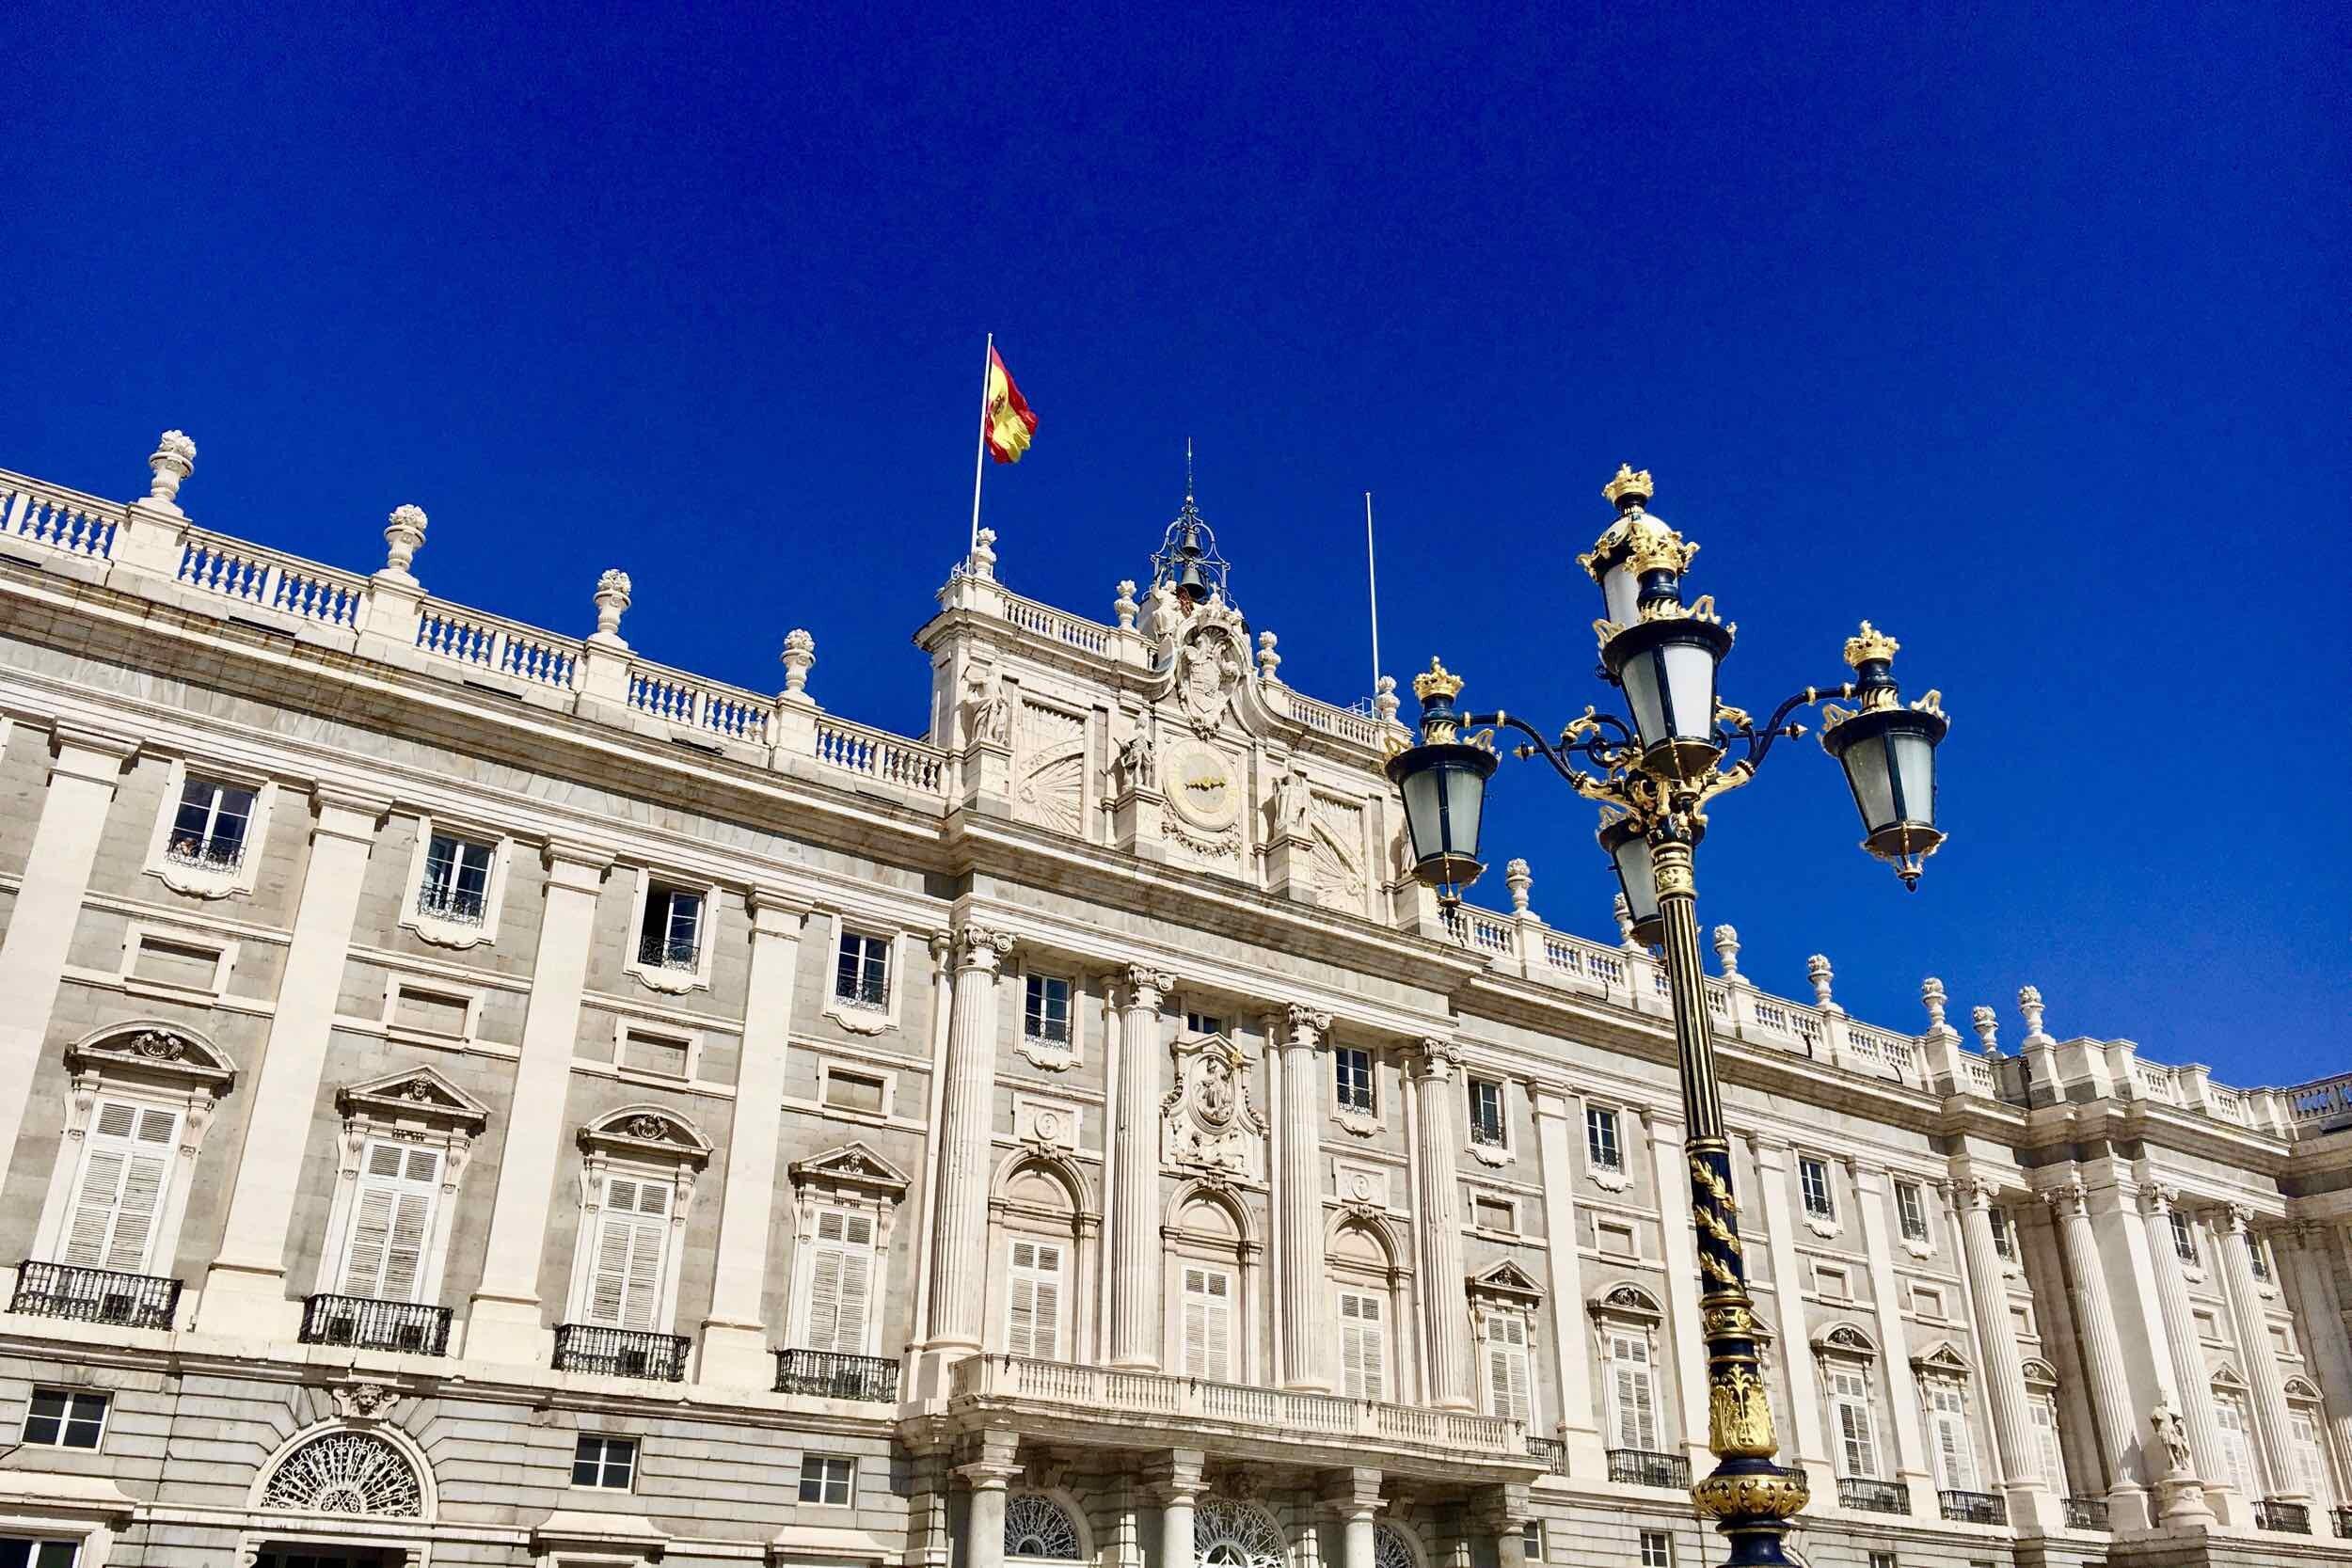 hemels-madrid-koninklijk-paleis-facade.jpg